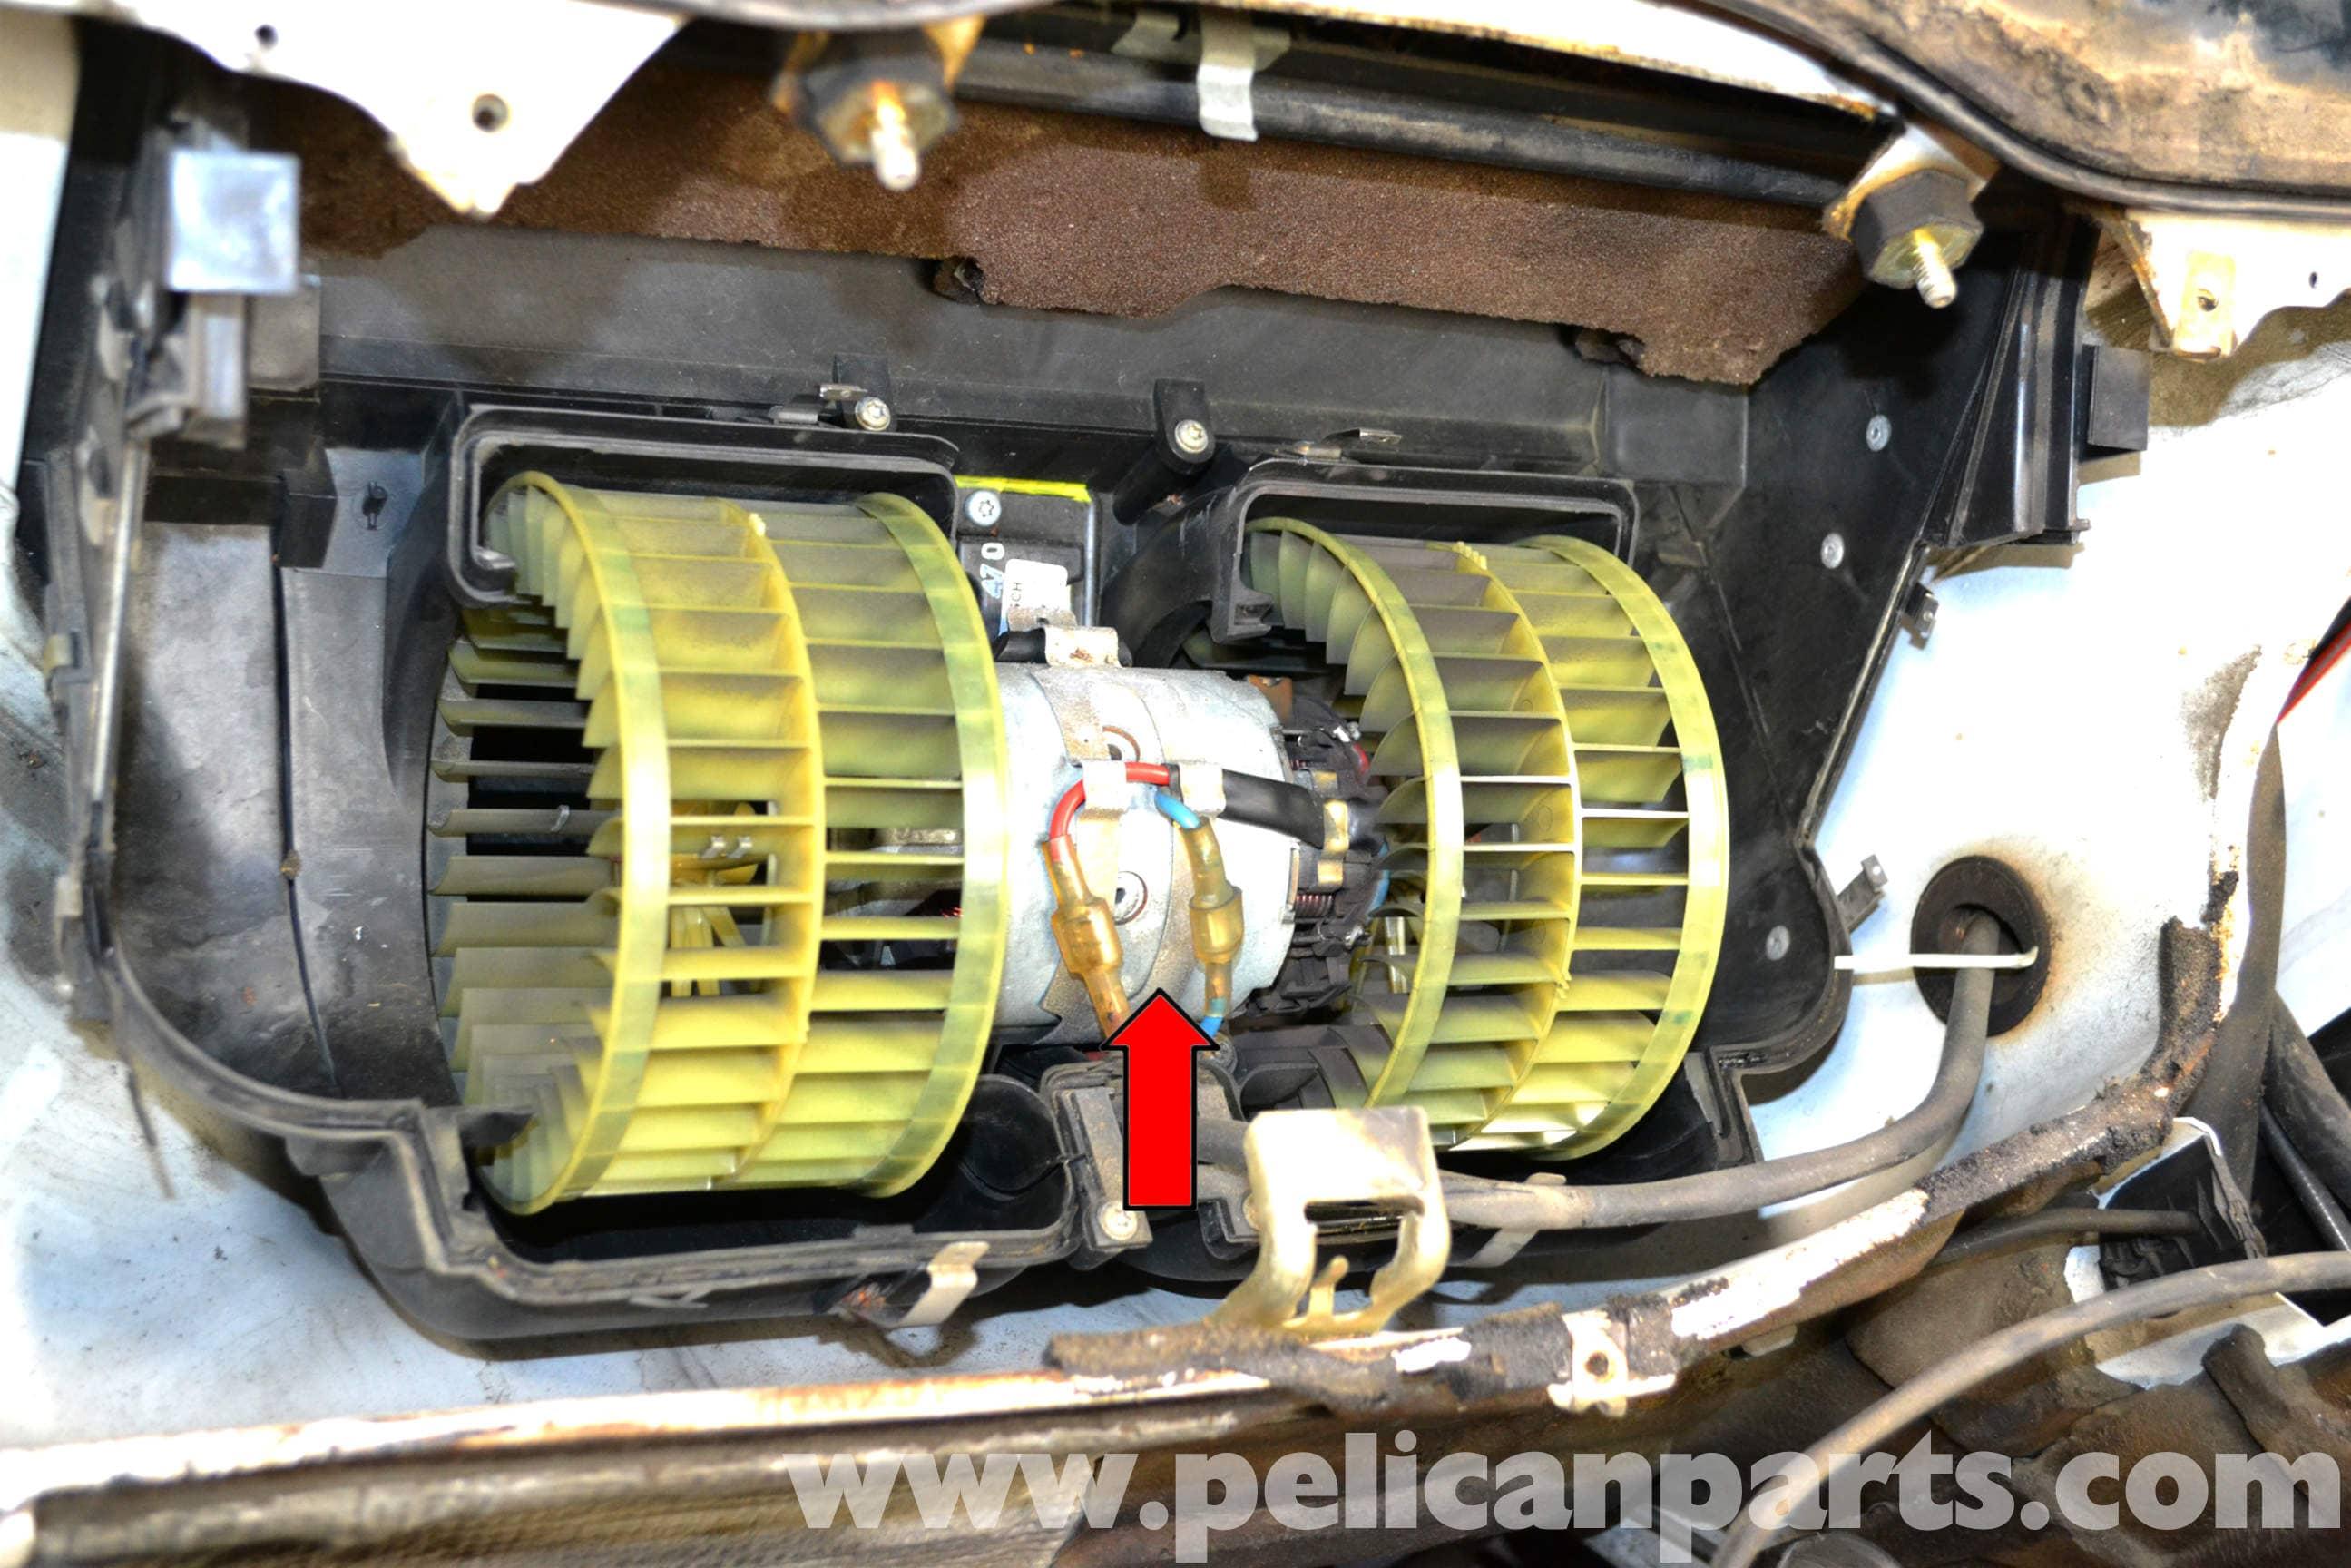 92 E350 Fuse Box Diagram Mercedes Benz W124 Hvac Resistor Replacement 1986 1995 E